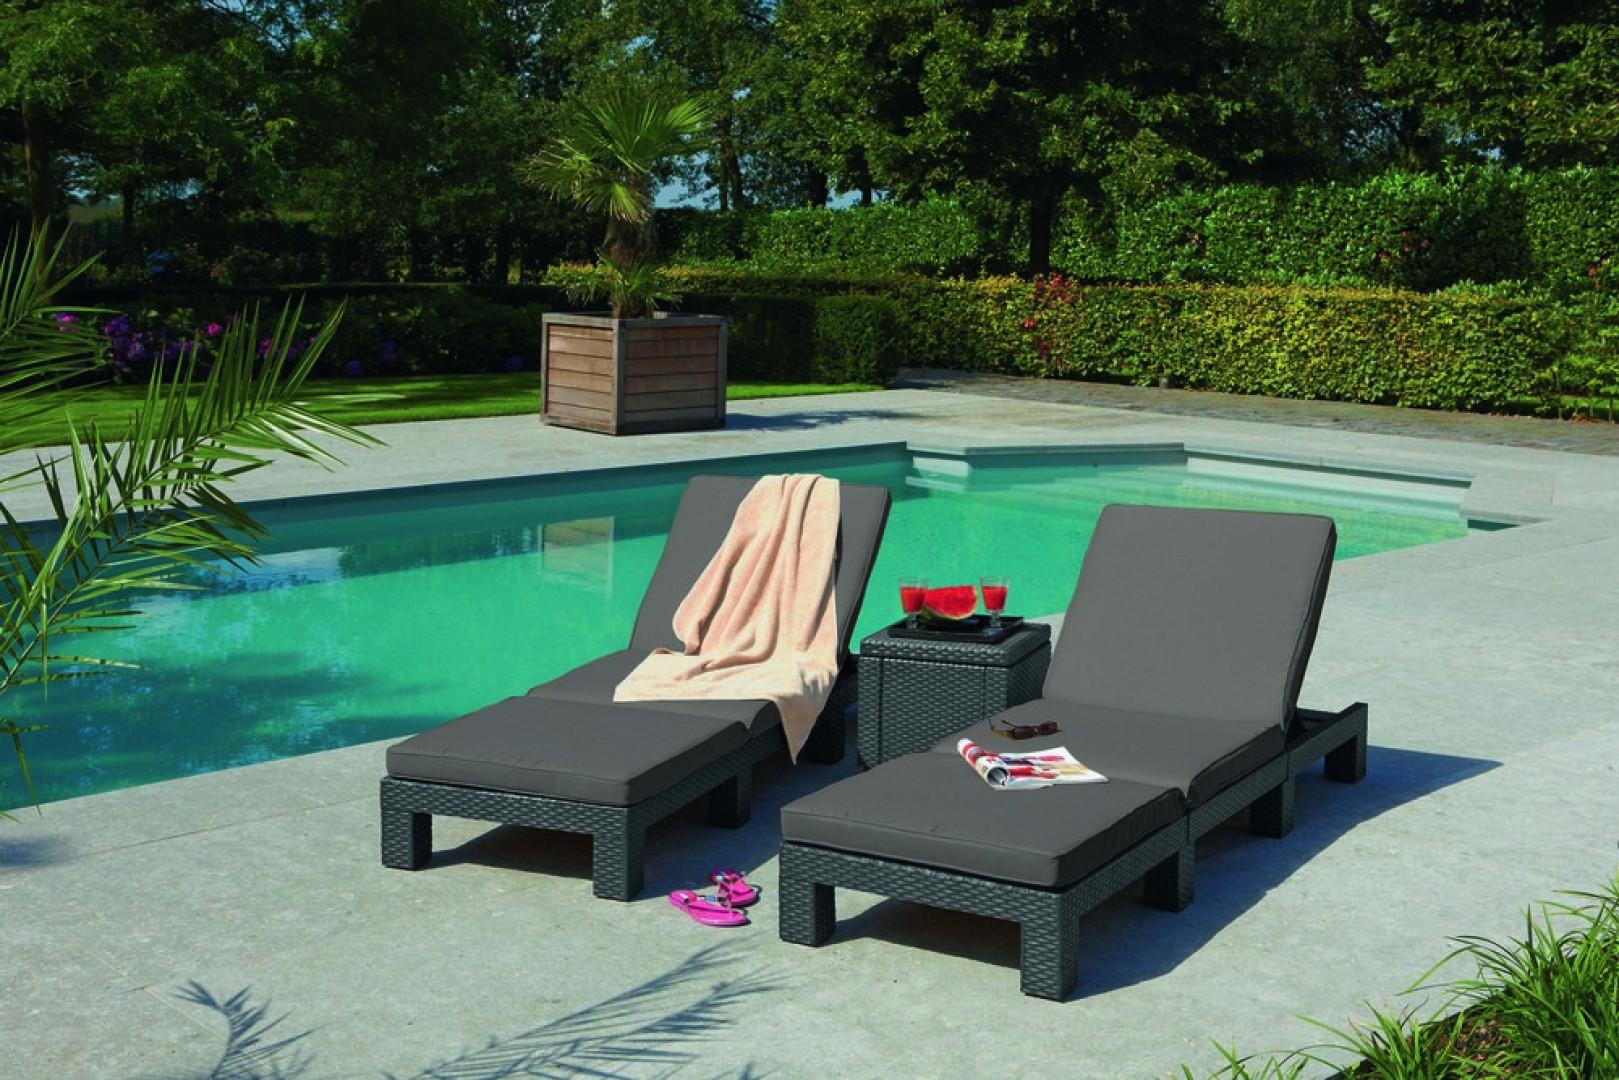 Leżak ogrodowy Daytona marki Keter. Fot. Keter